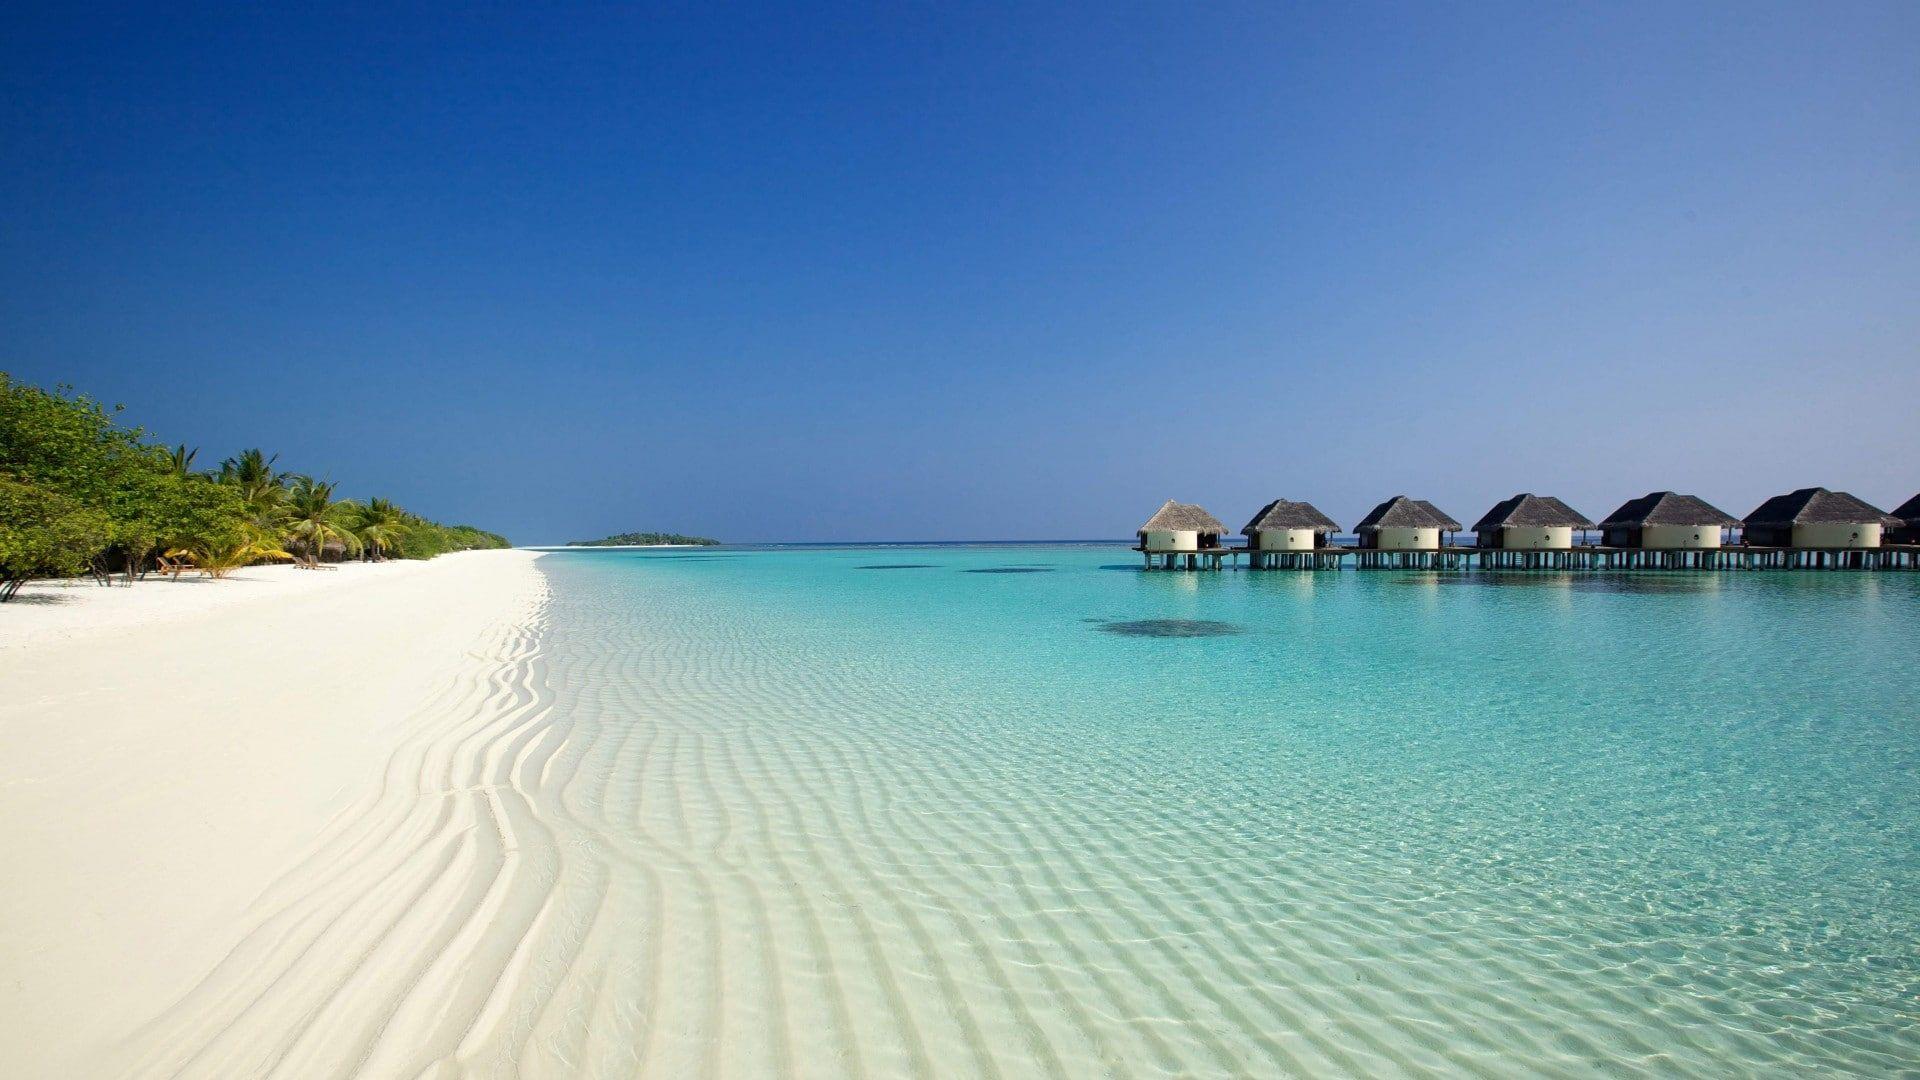 Bali Beach 1080p Wallpaper Hdwallpaper Desktop In 2021 Beach Wallpaper Wallpapers Beach Ocean Wallpaper